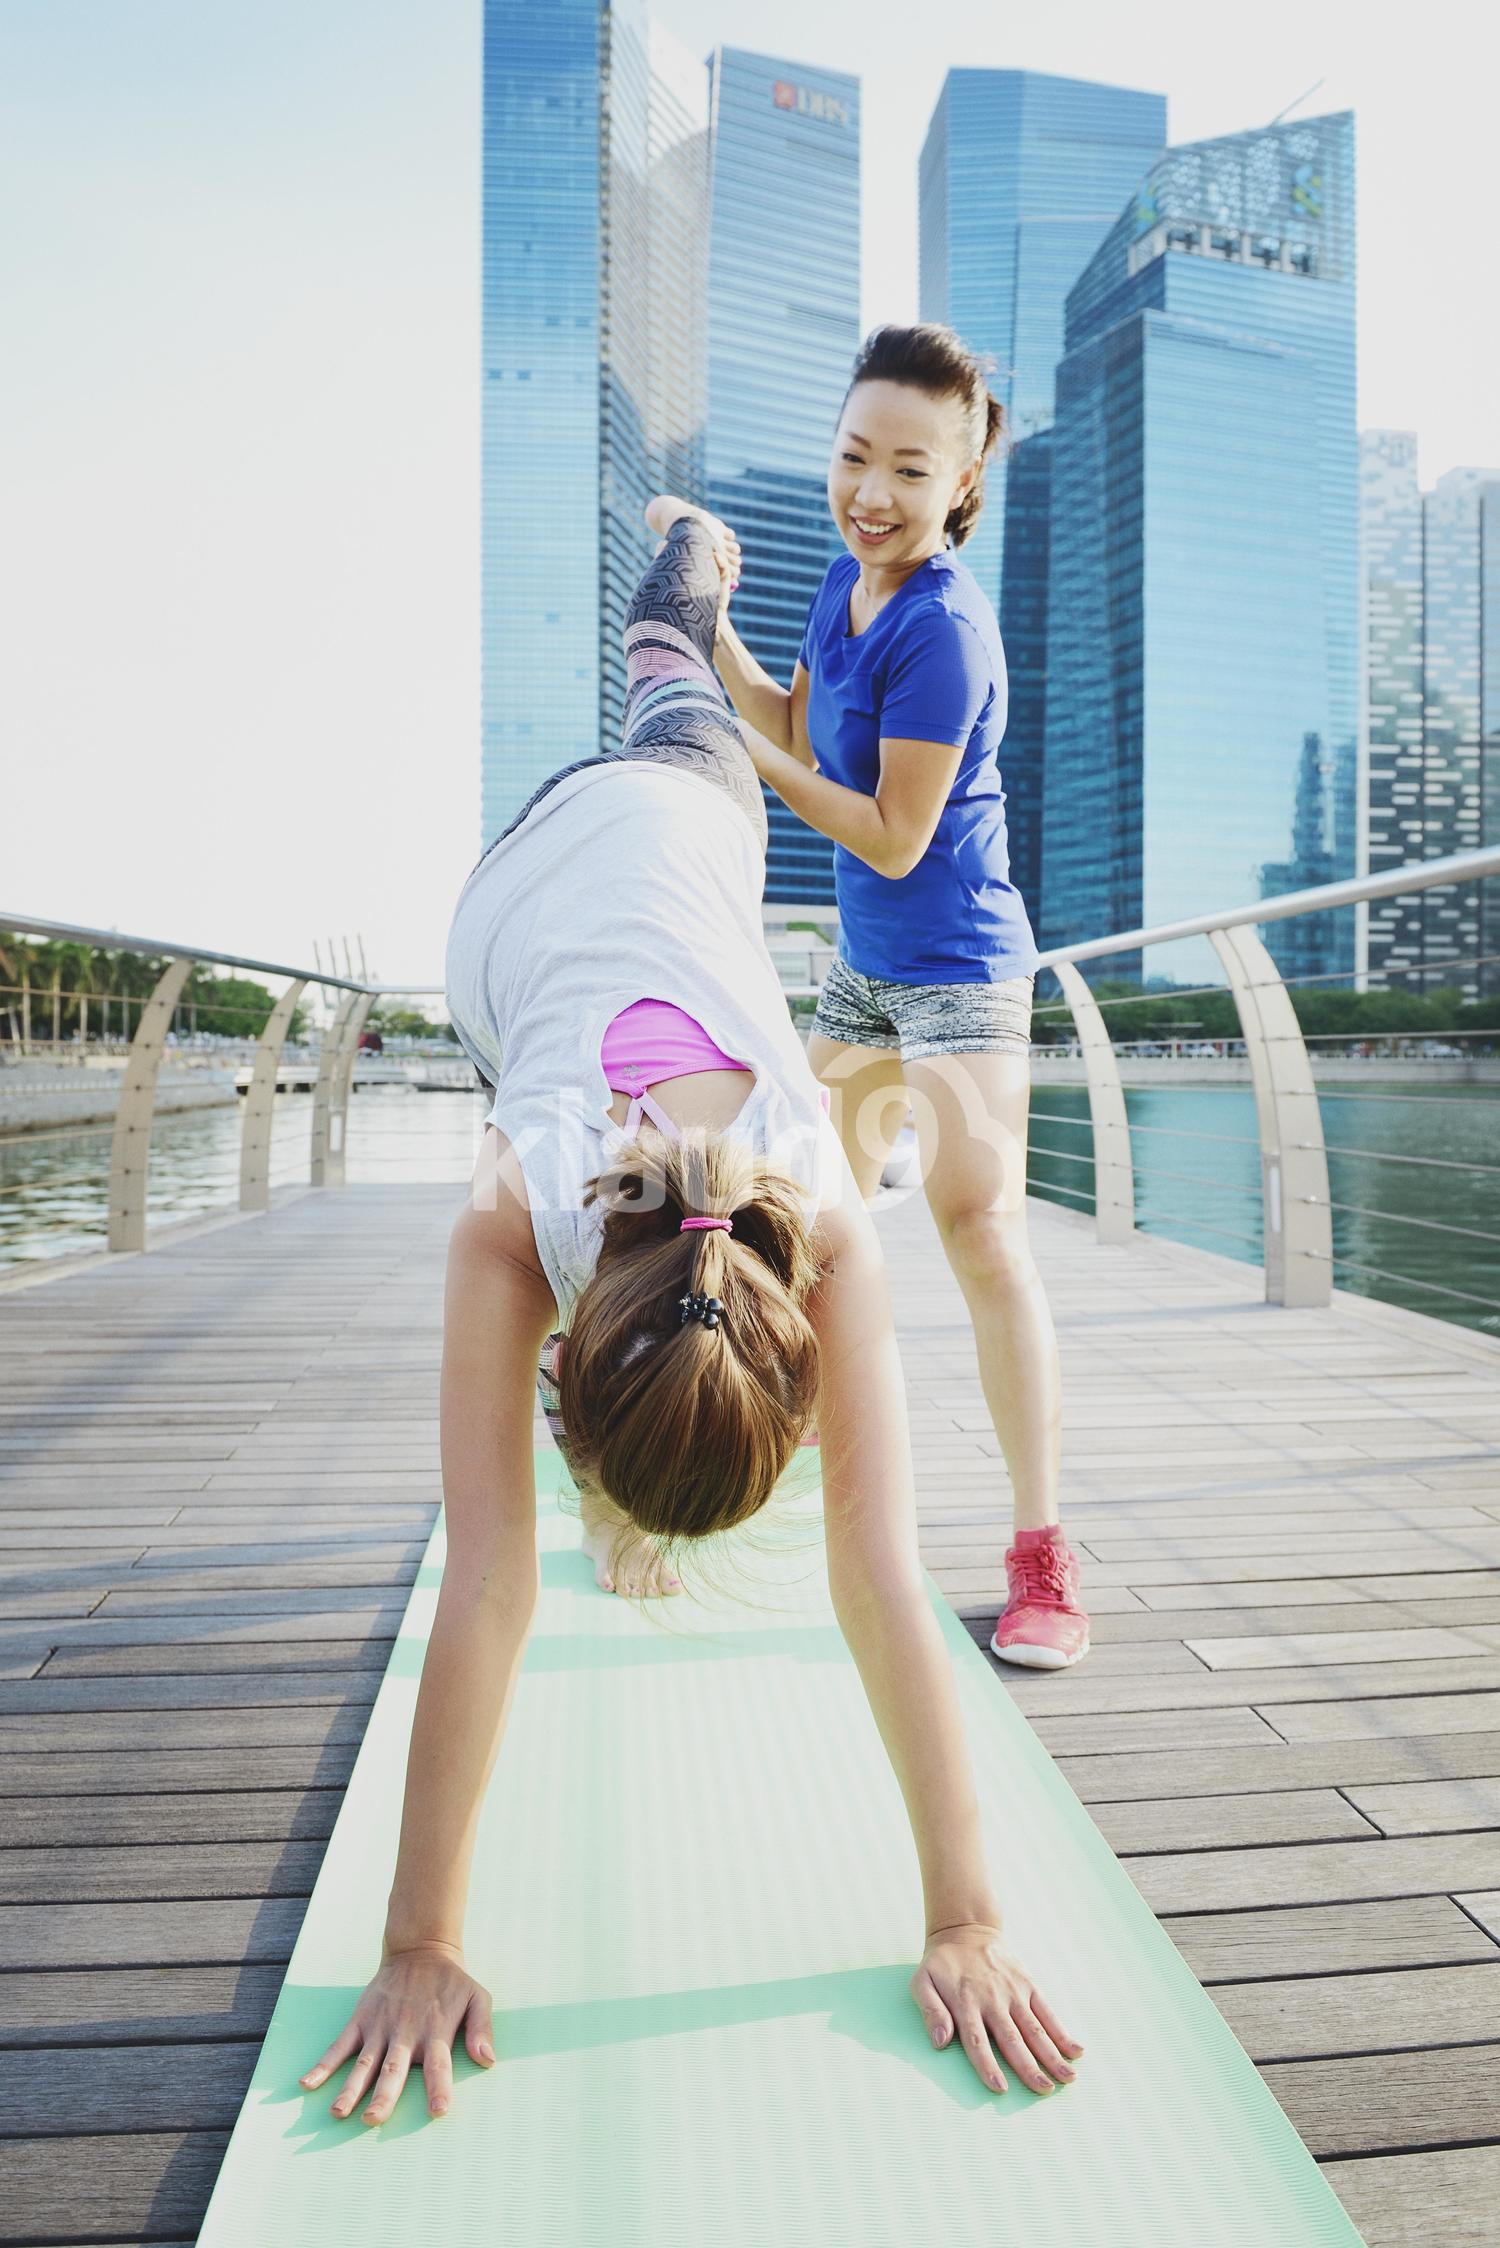 Friends practising Yoga at Marina Bay Sands